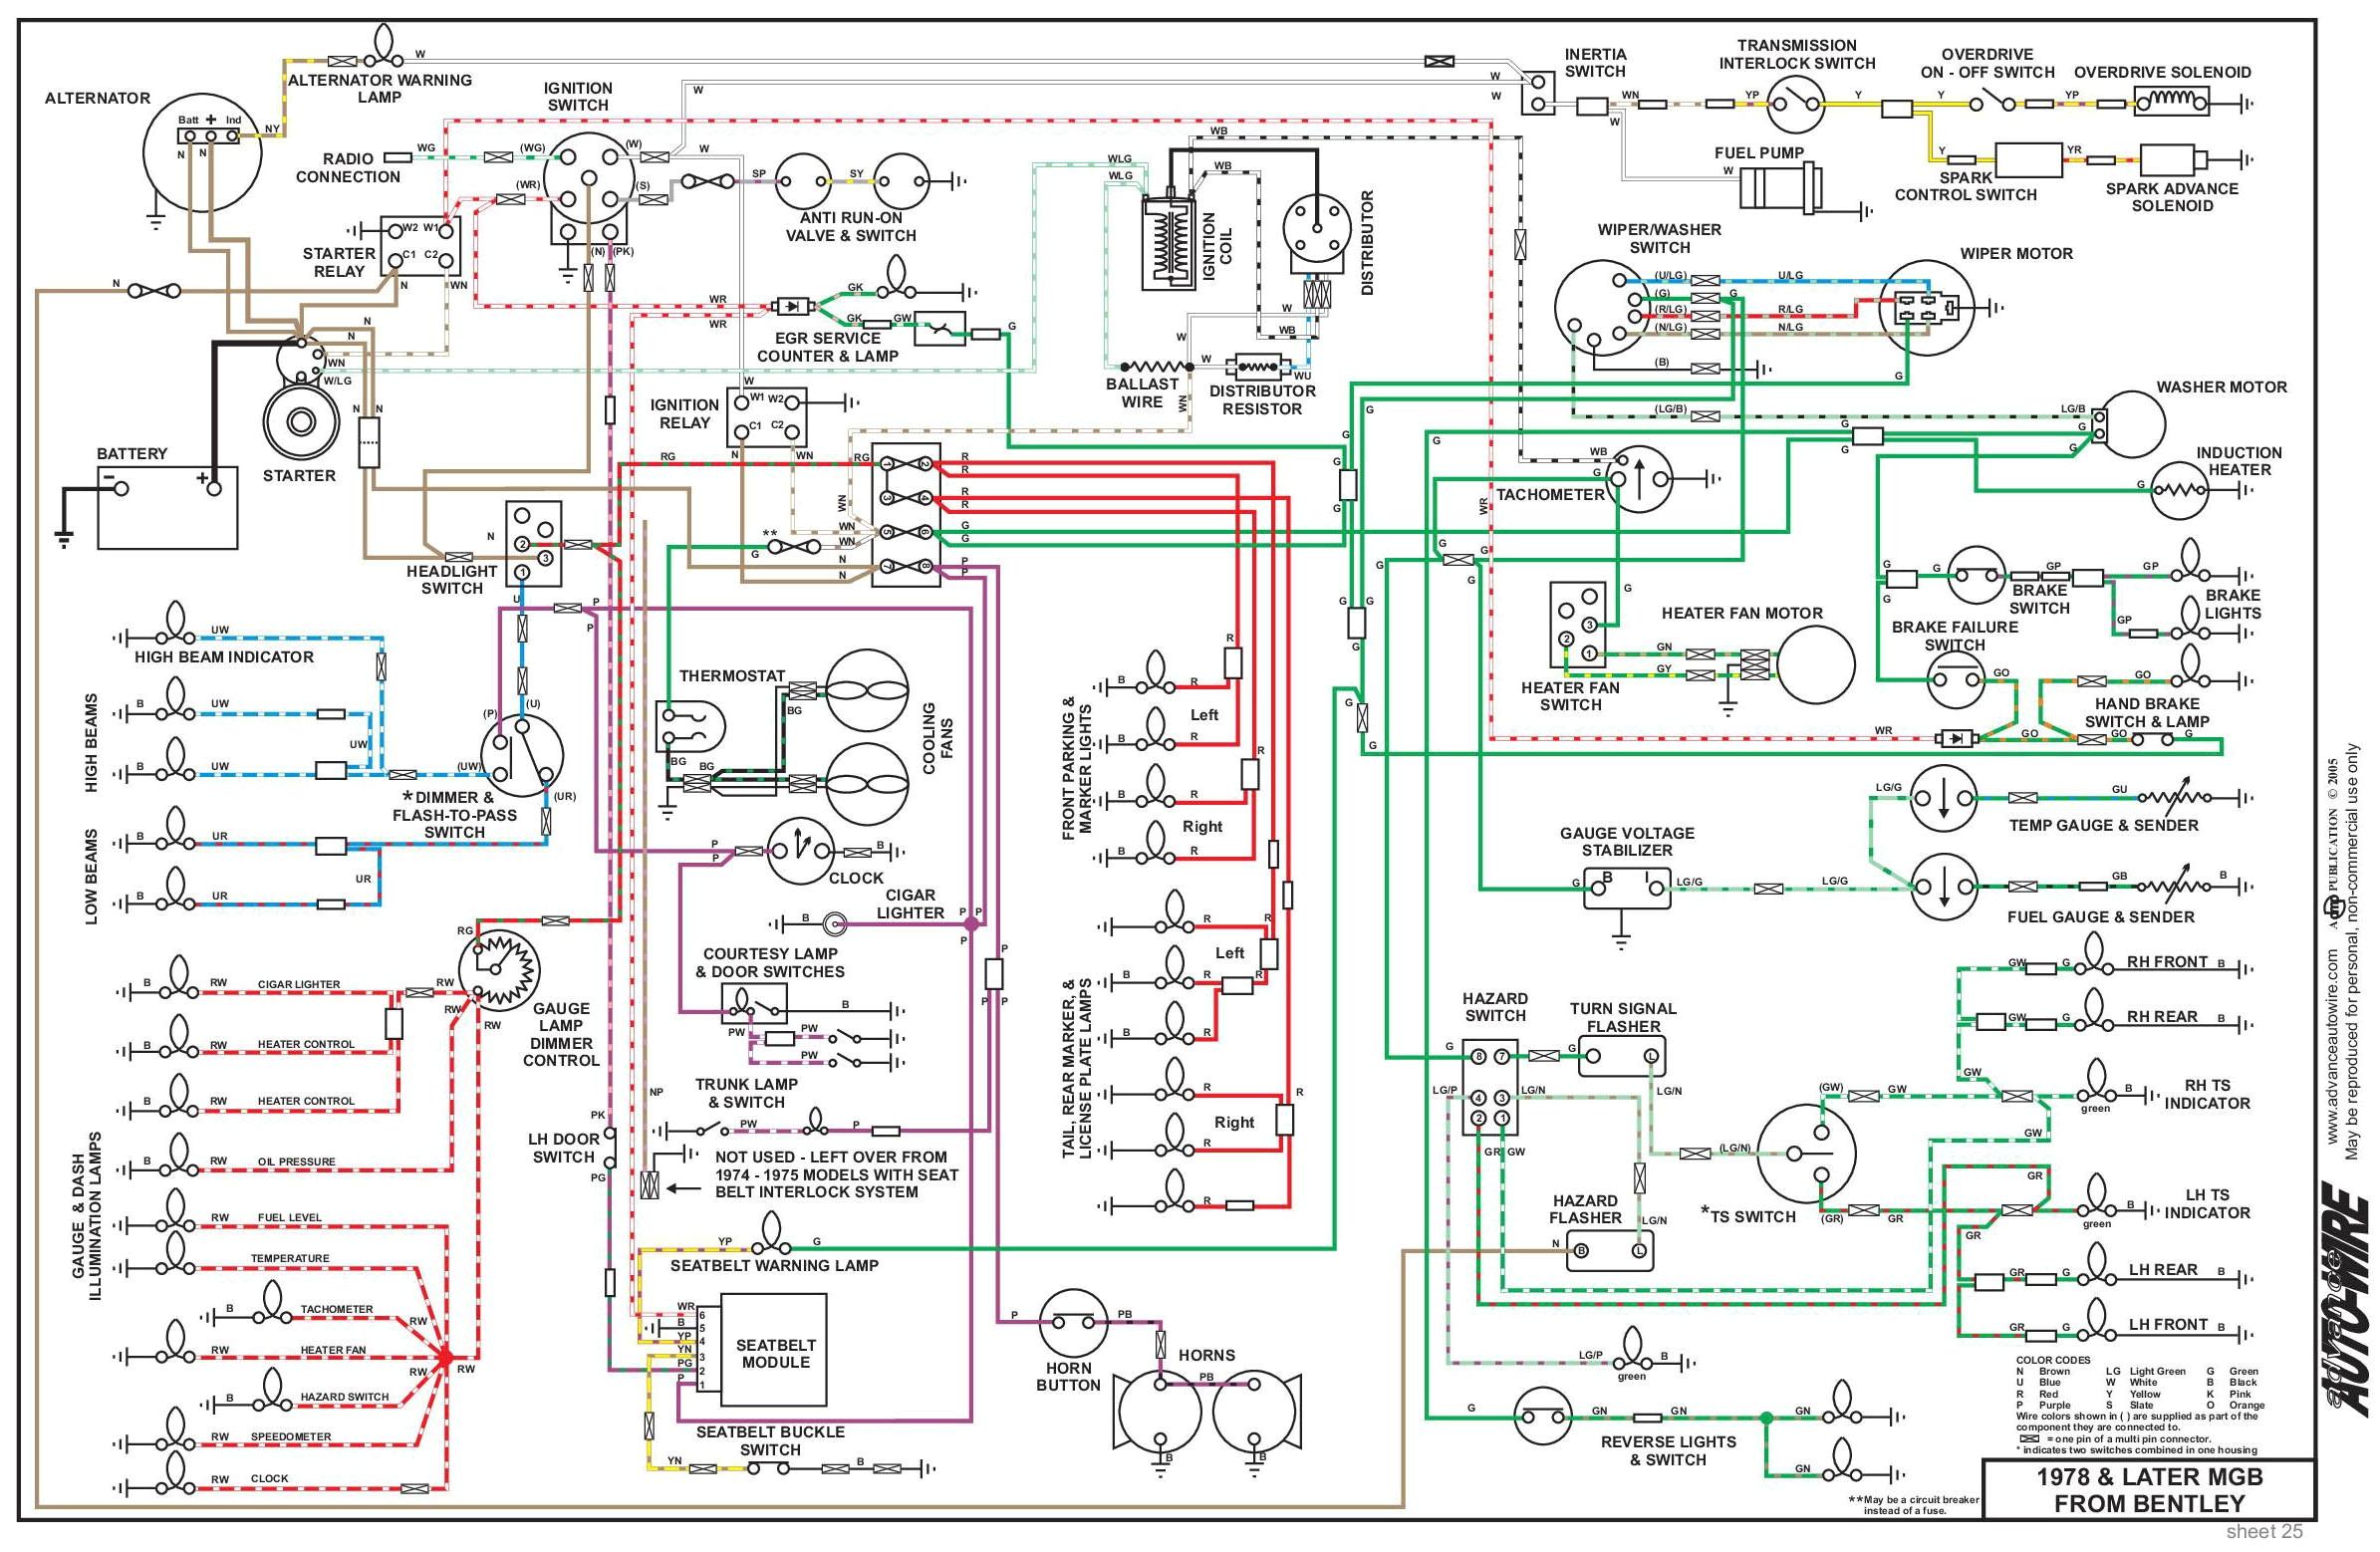 1976 mgb wiring diagram wiring diagram expert 1976 mgb wiring diagram 1976 mgb wiring diagram